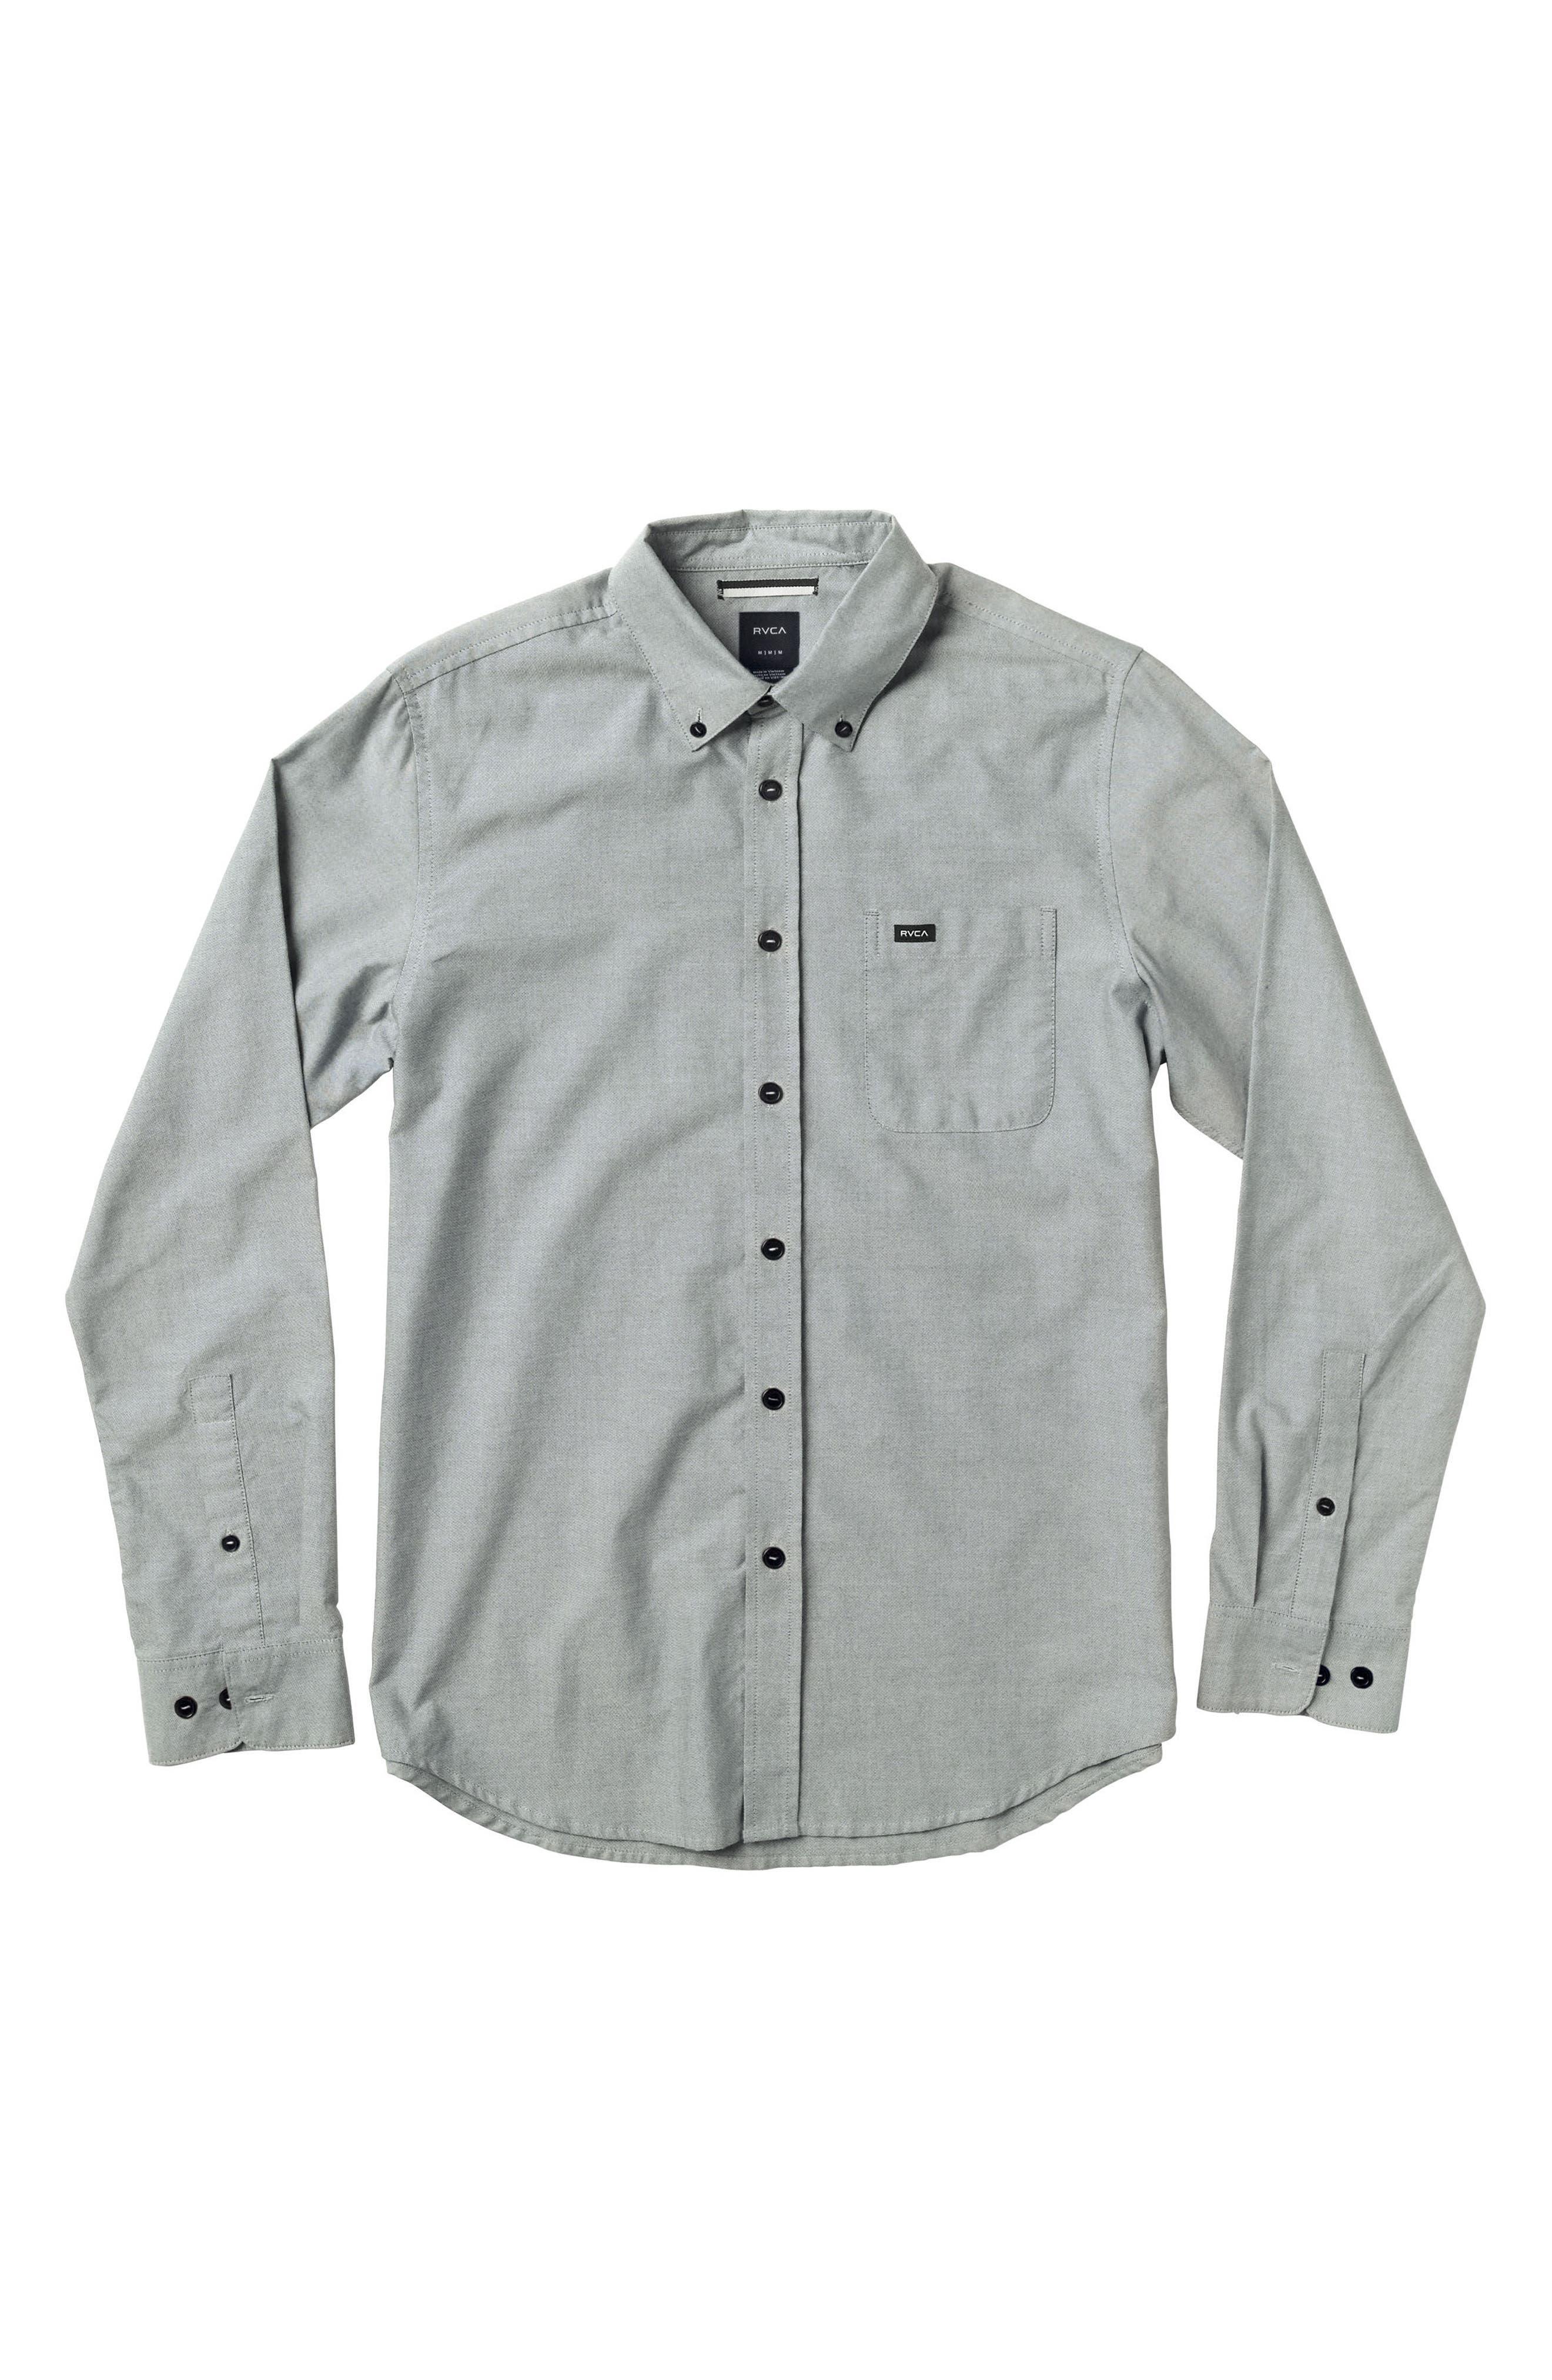 RVCA 'That'll Do' Long Sleeve Oxford Woven Shirt (Big Boys)